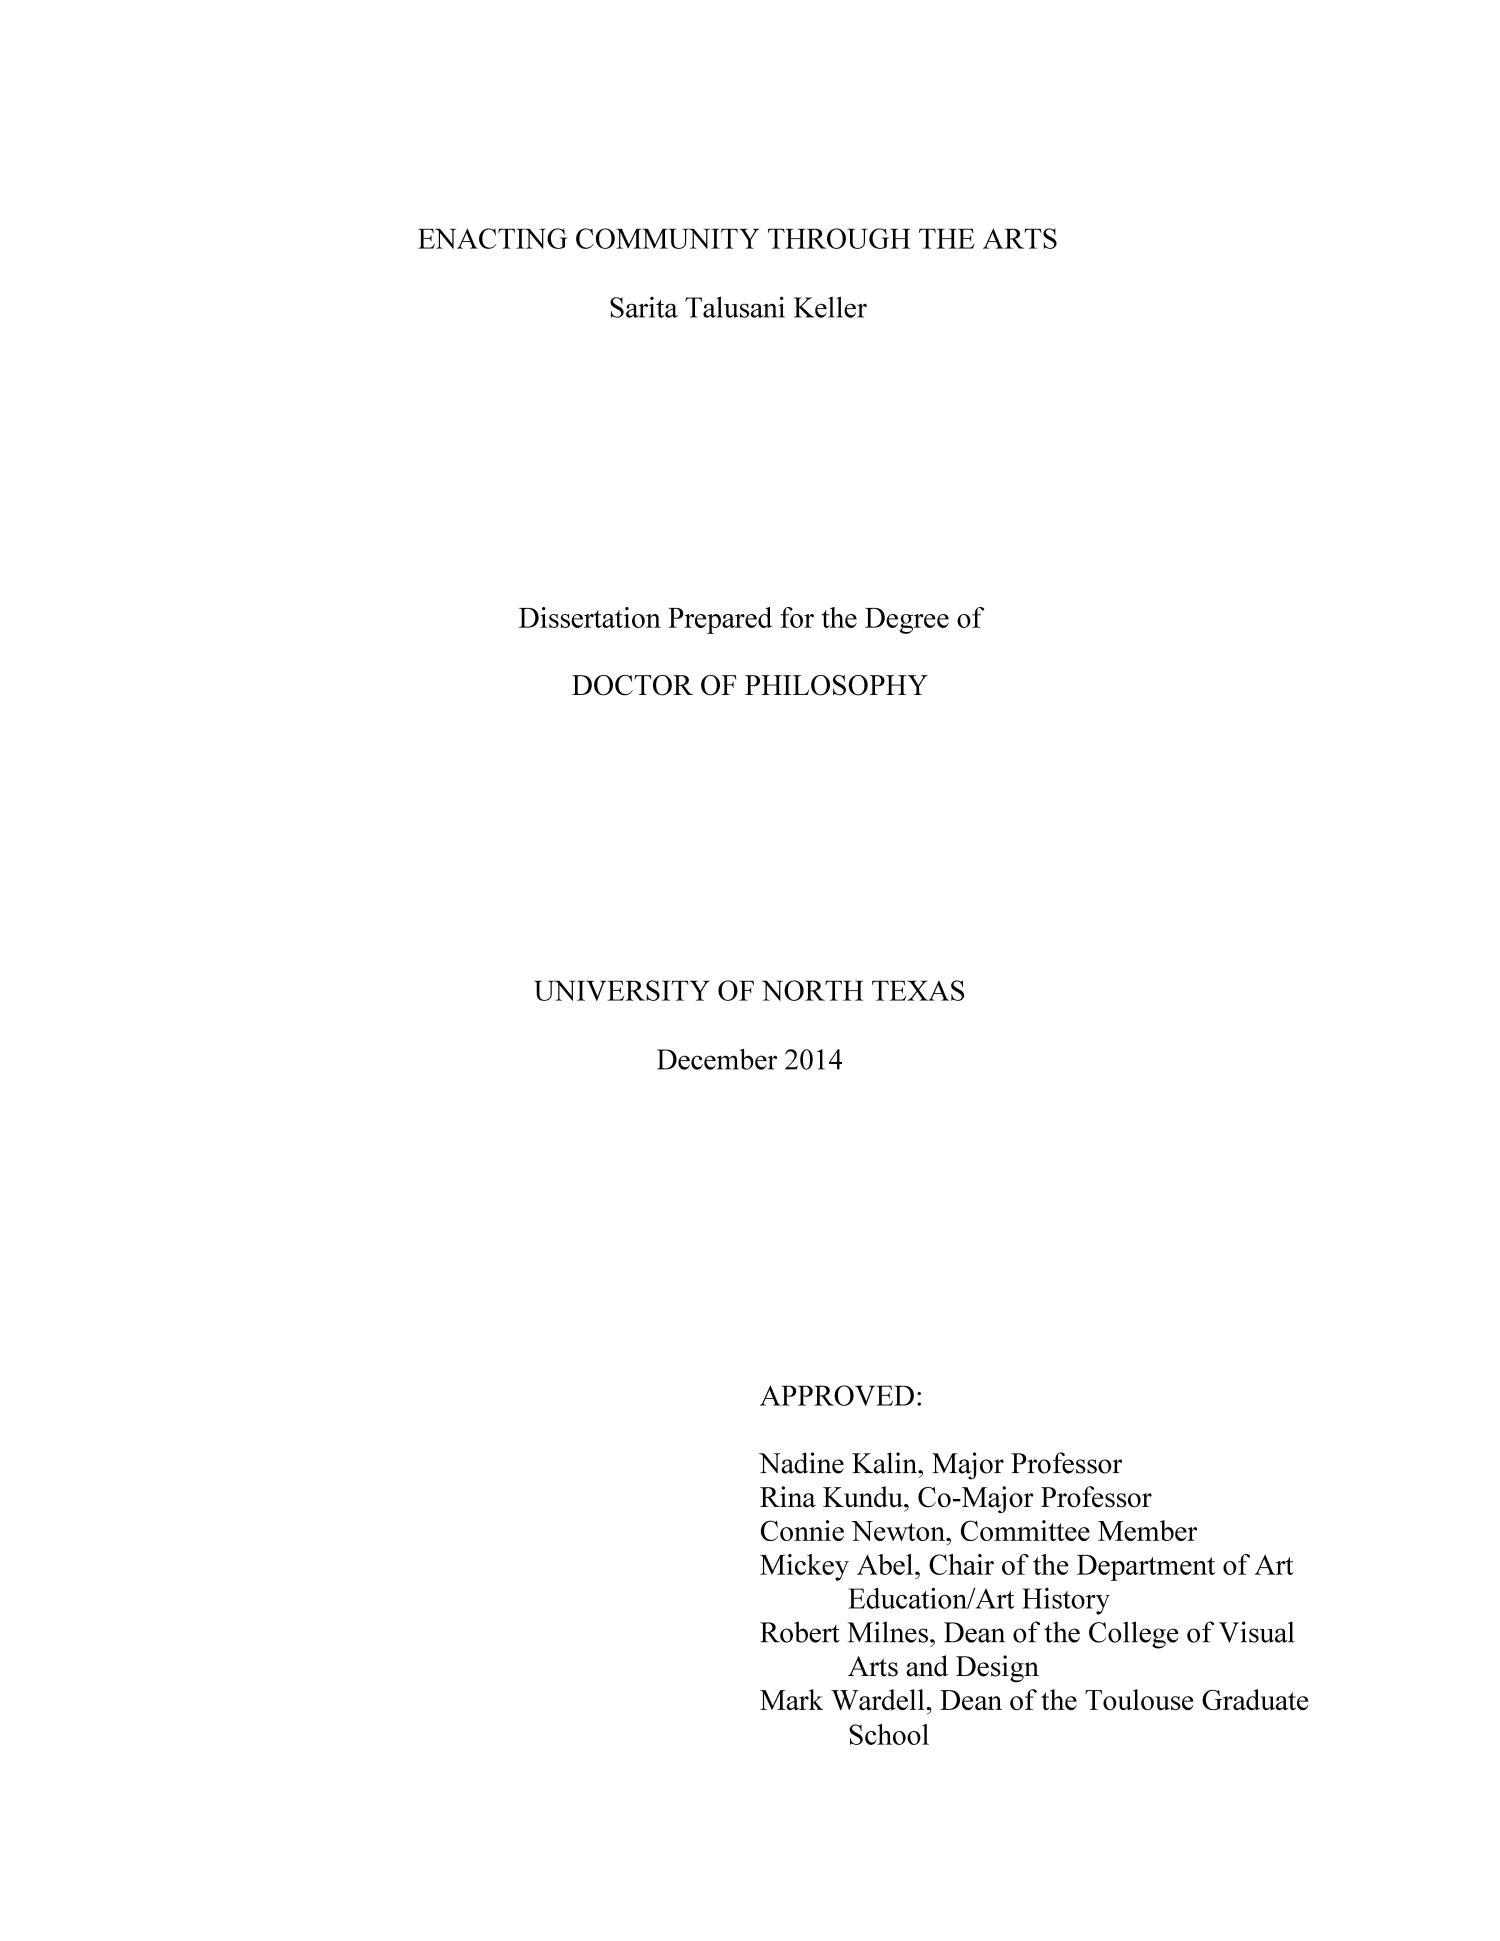 Art dissertation social work dissertation